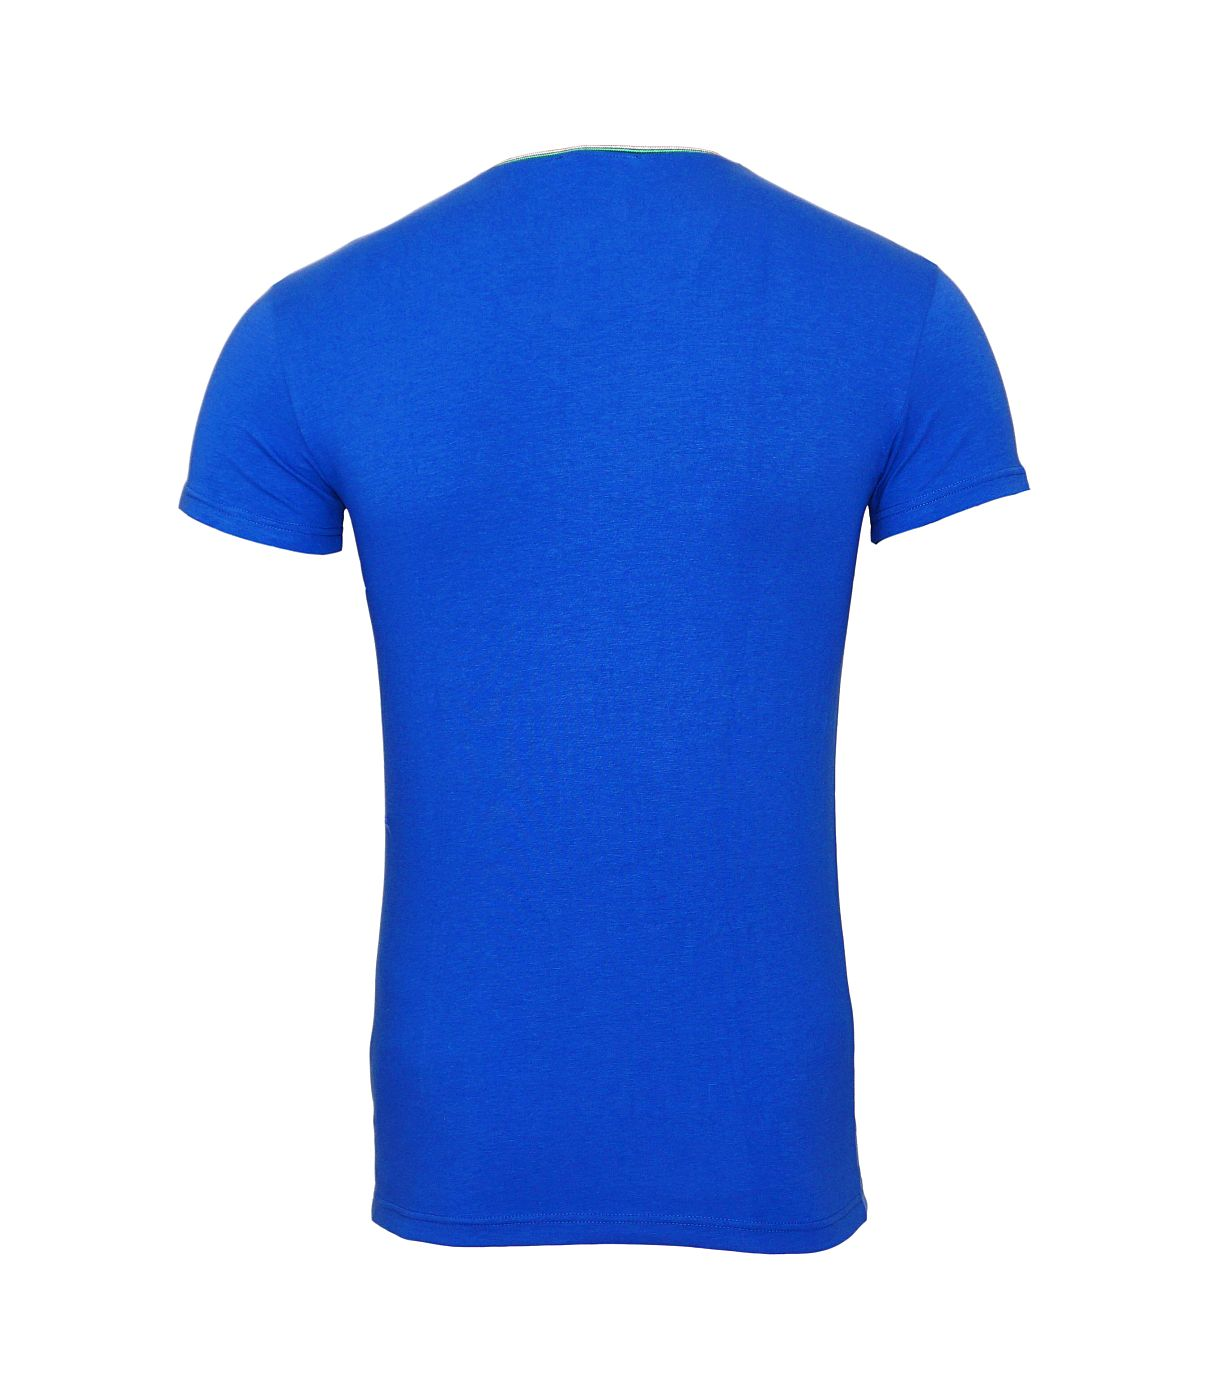 Emporio Armani T-Shirts V-Ausschnitt 110810 8A510 23233 MAZARINE SH18-EAT2